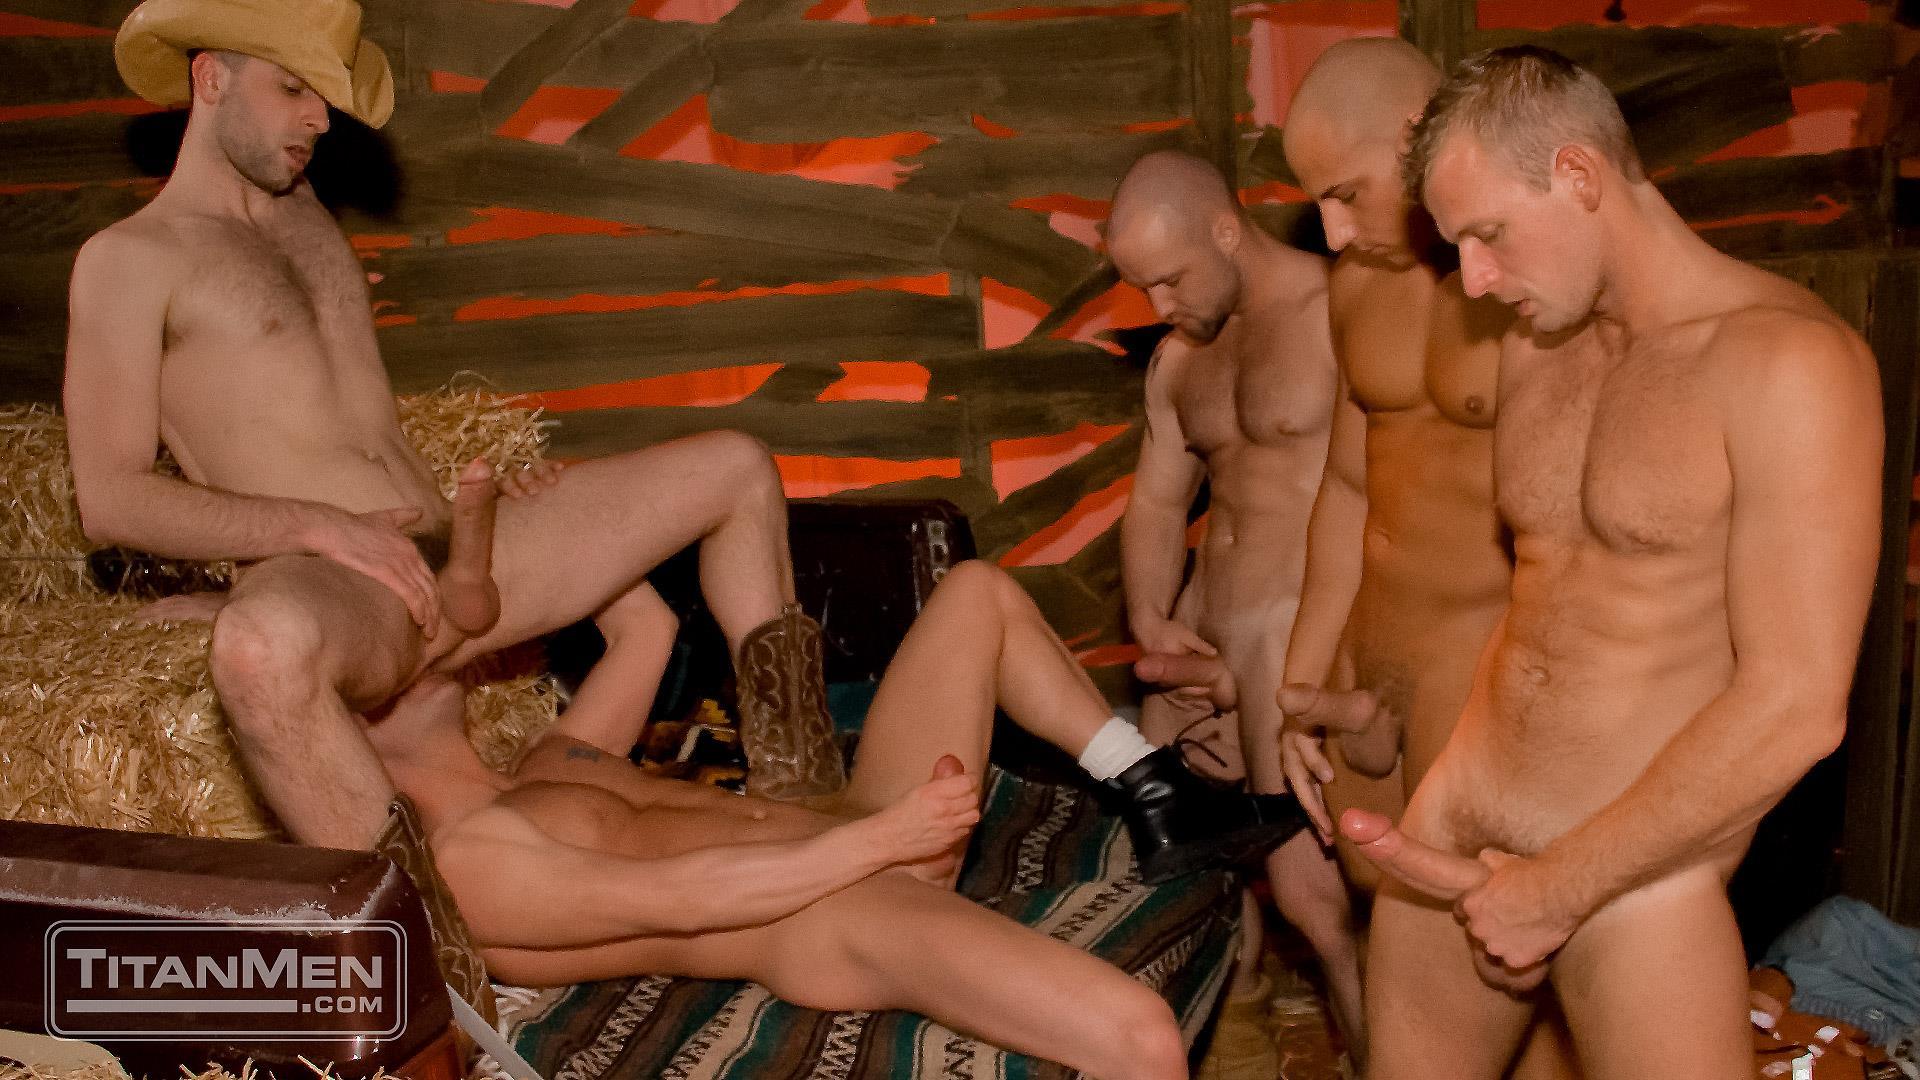 TitanMen Joe Gage Rednecks With Big Cocks Amateur Gay Porn 34 Big Cock Rednecks From TitanMen and Joe Gage